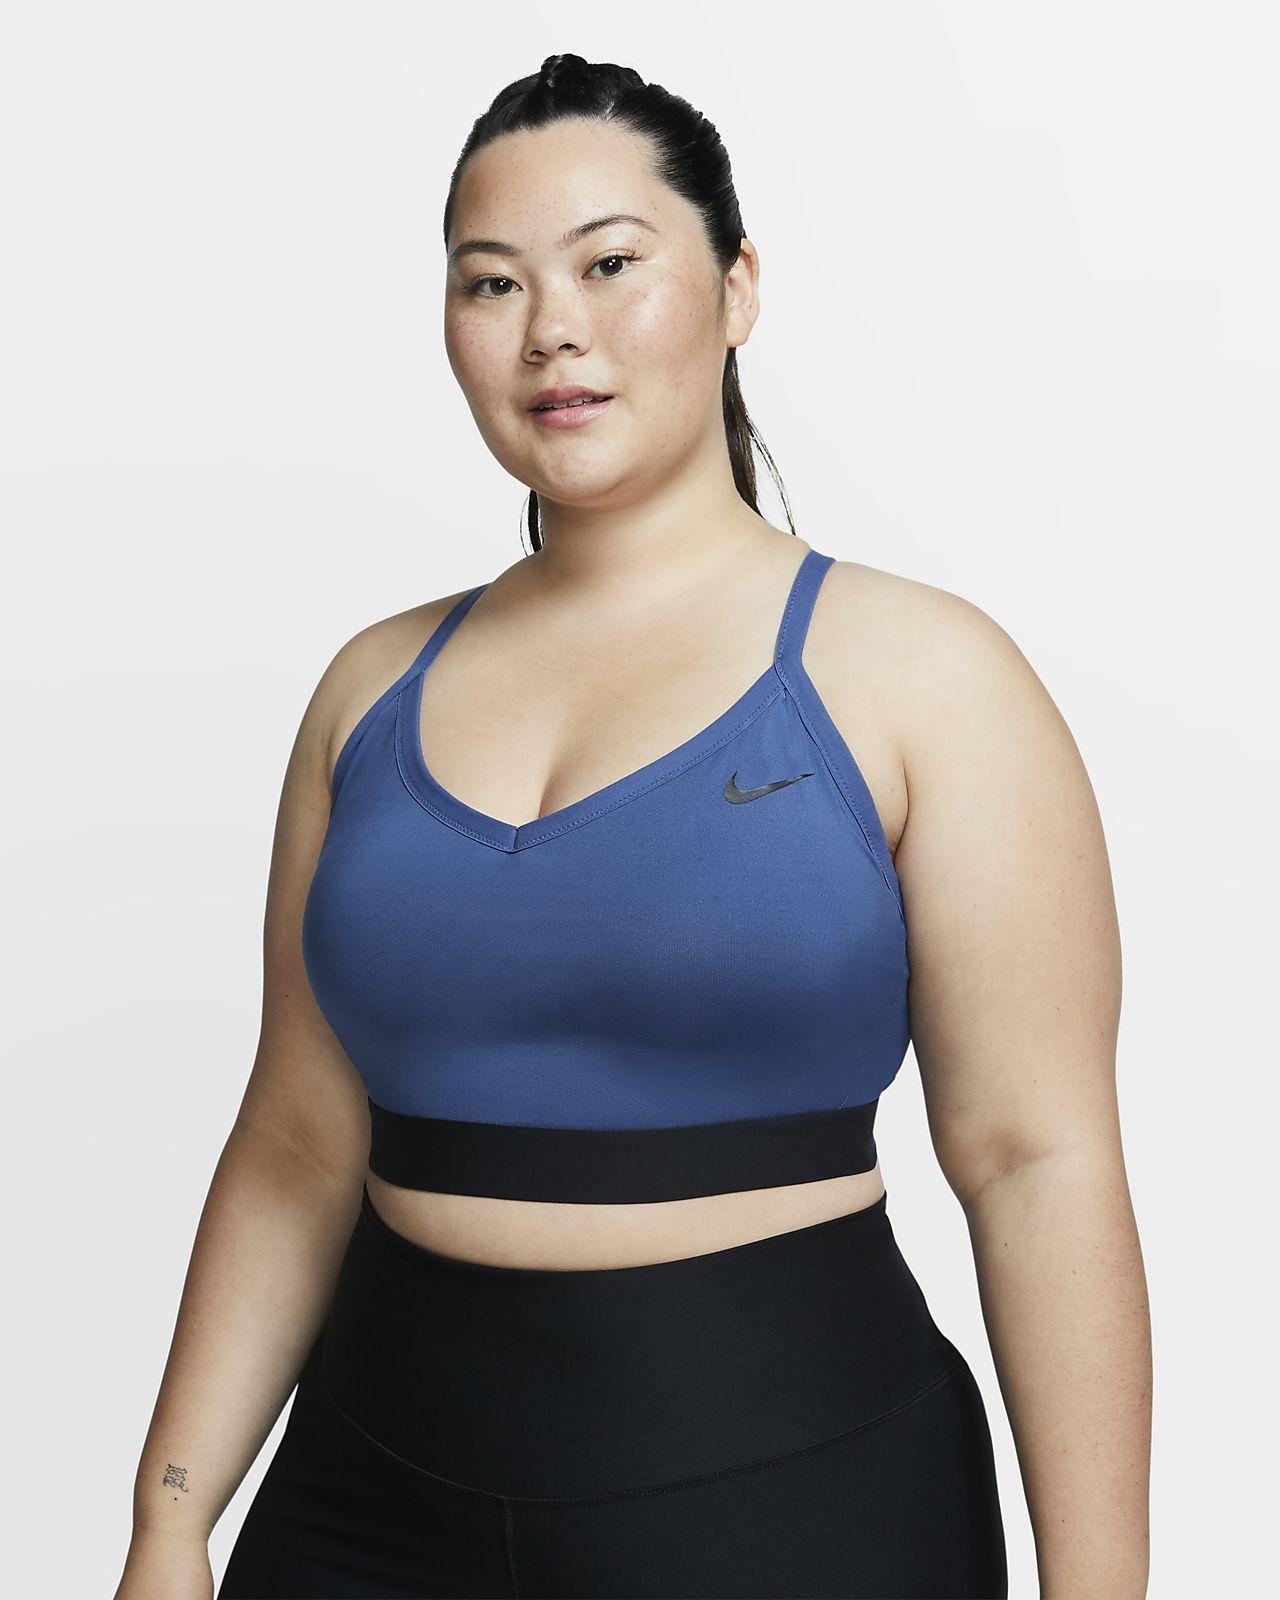 Nike Indy Women's LightSupport Sports Bra (Plus Size